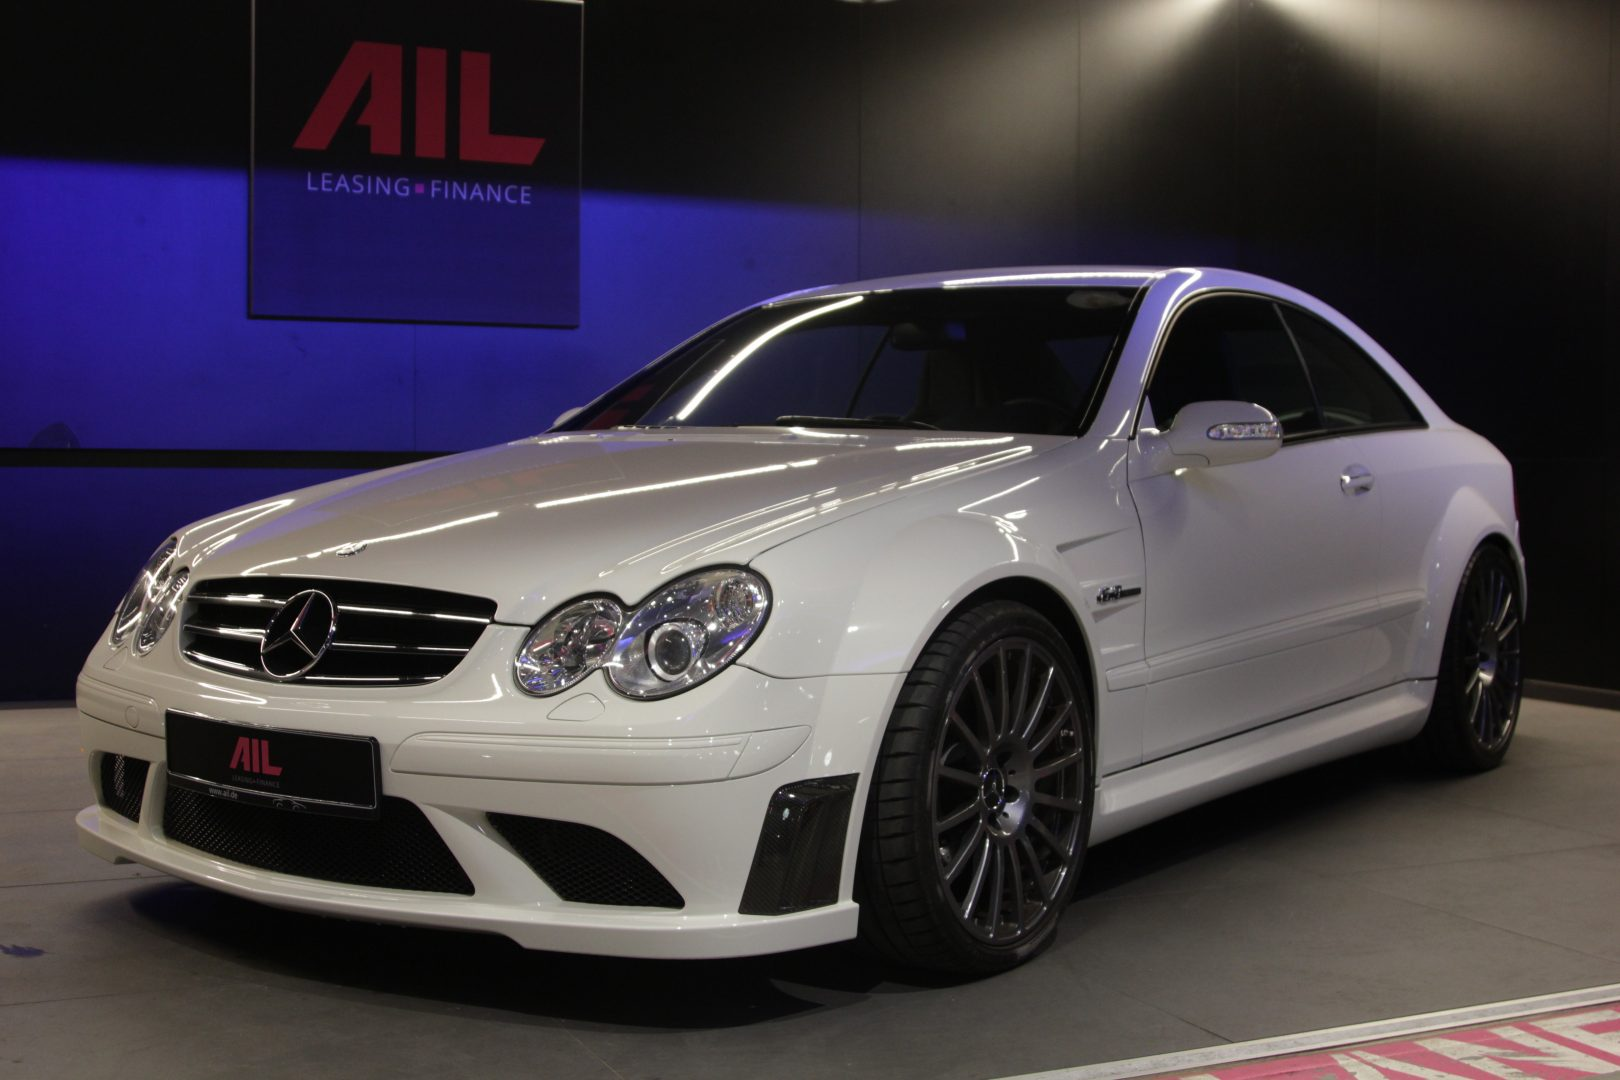 AIL Mercedes-Benz CLK 63 AMG Black Series 6